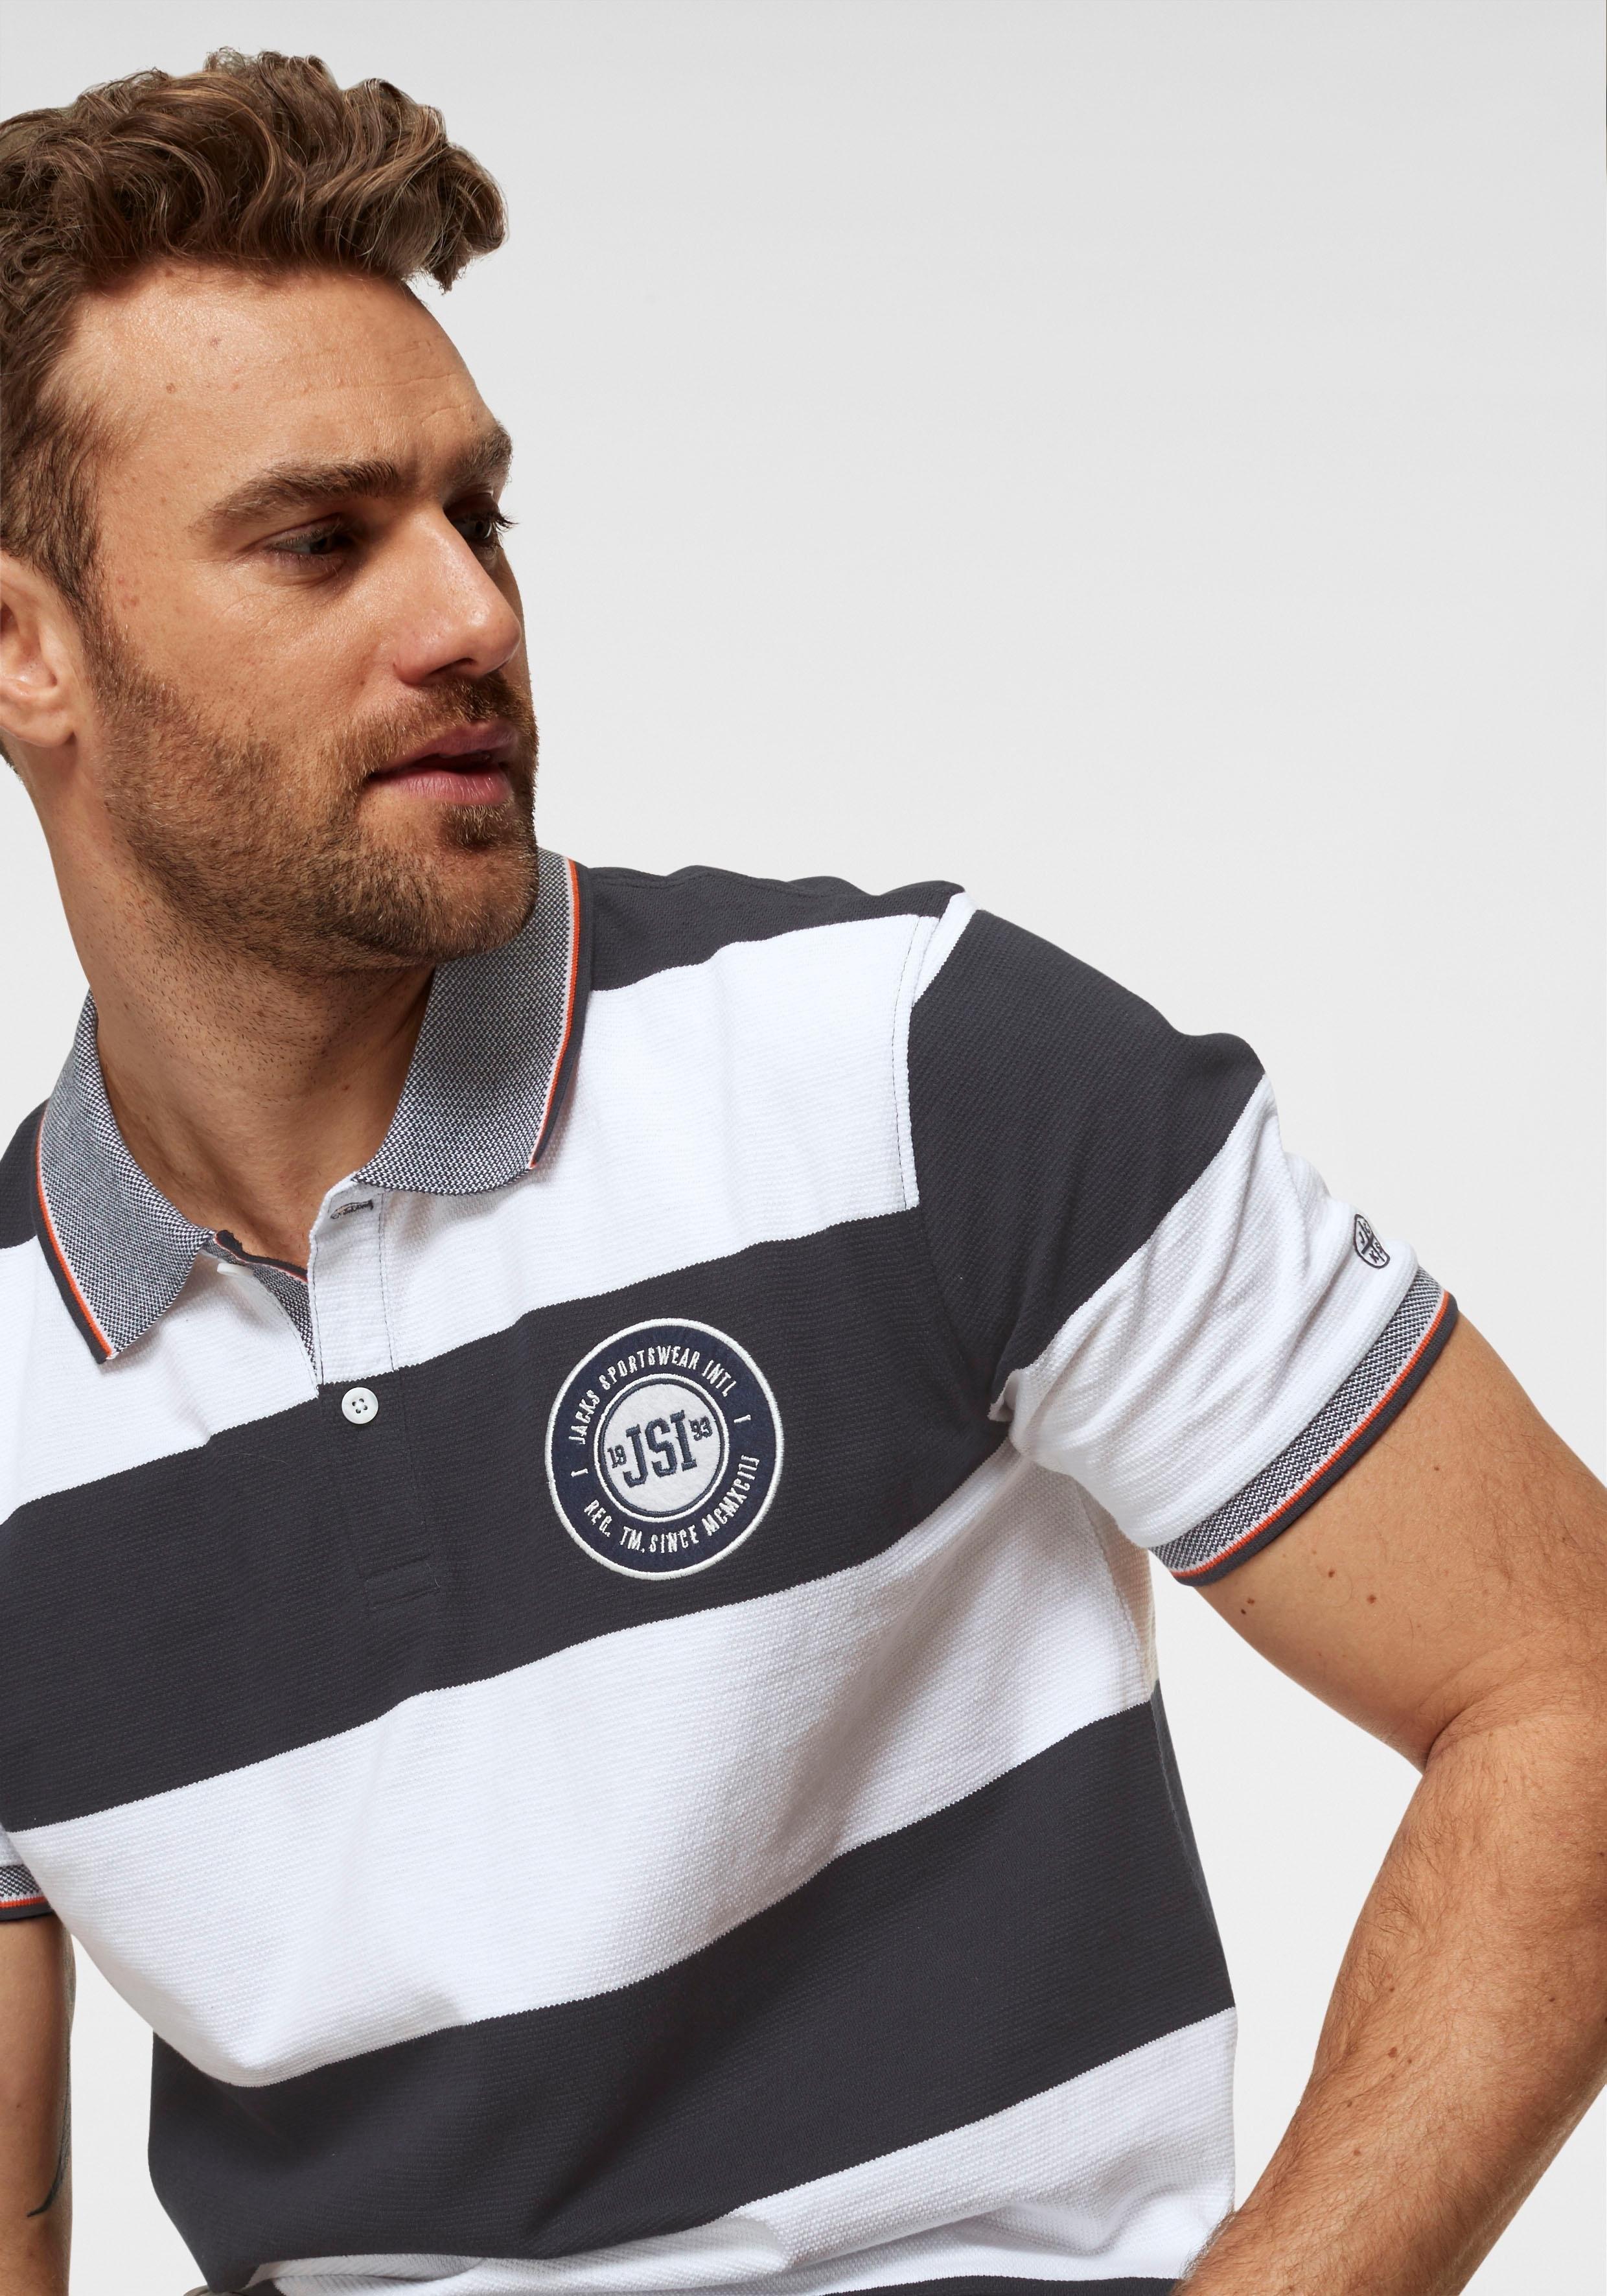 Verkrijgbaar Poloshirt Poloshirt Jack's Jack's Online TXZOPkiu